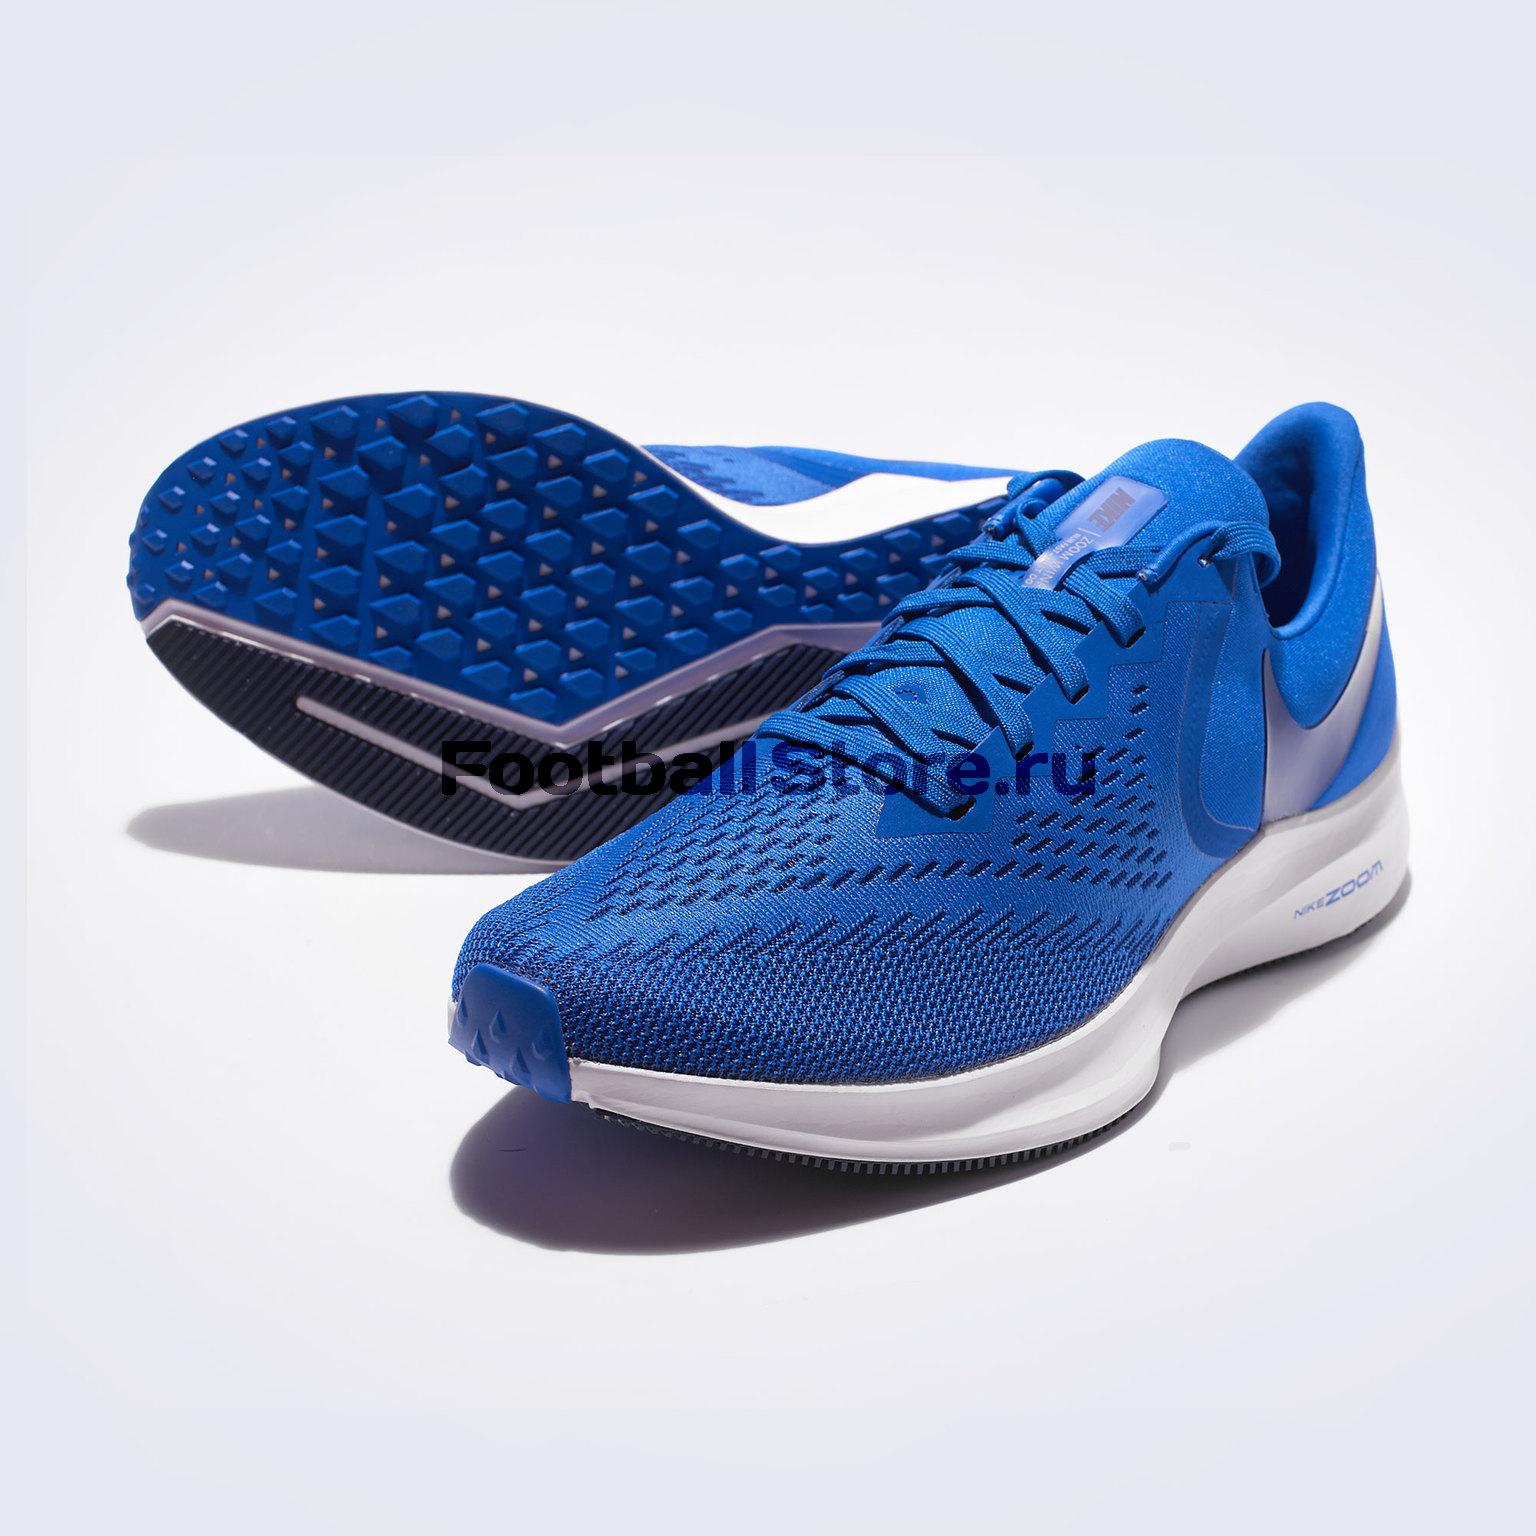 Кроссовки Nike Zoom Winflo 6 AQ7497-402 цена